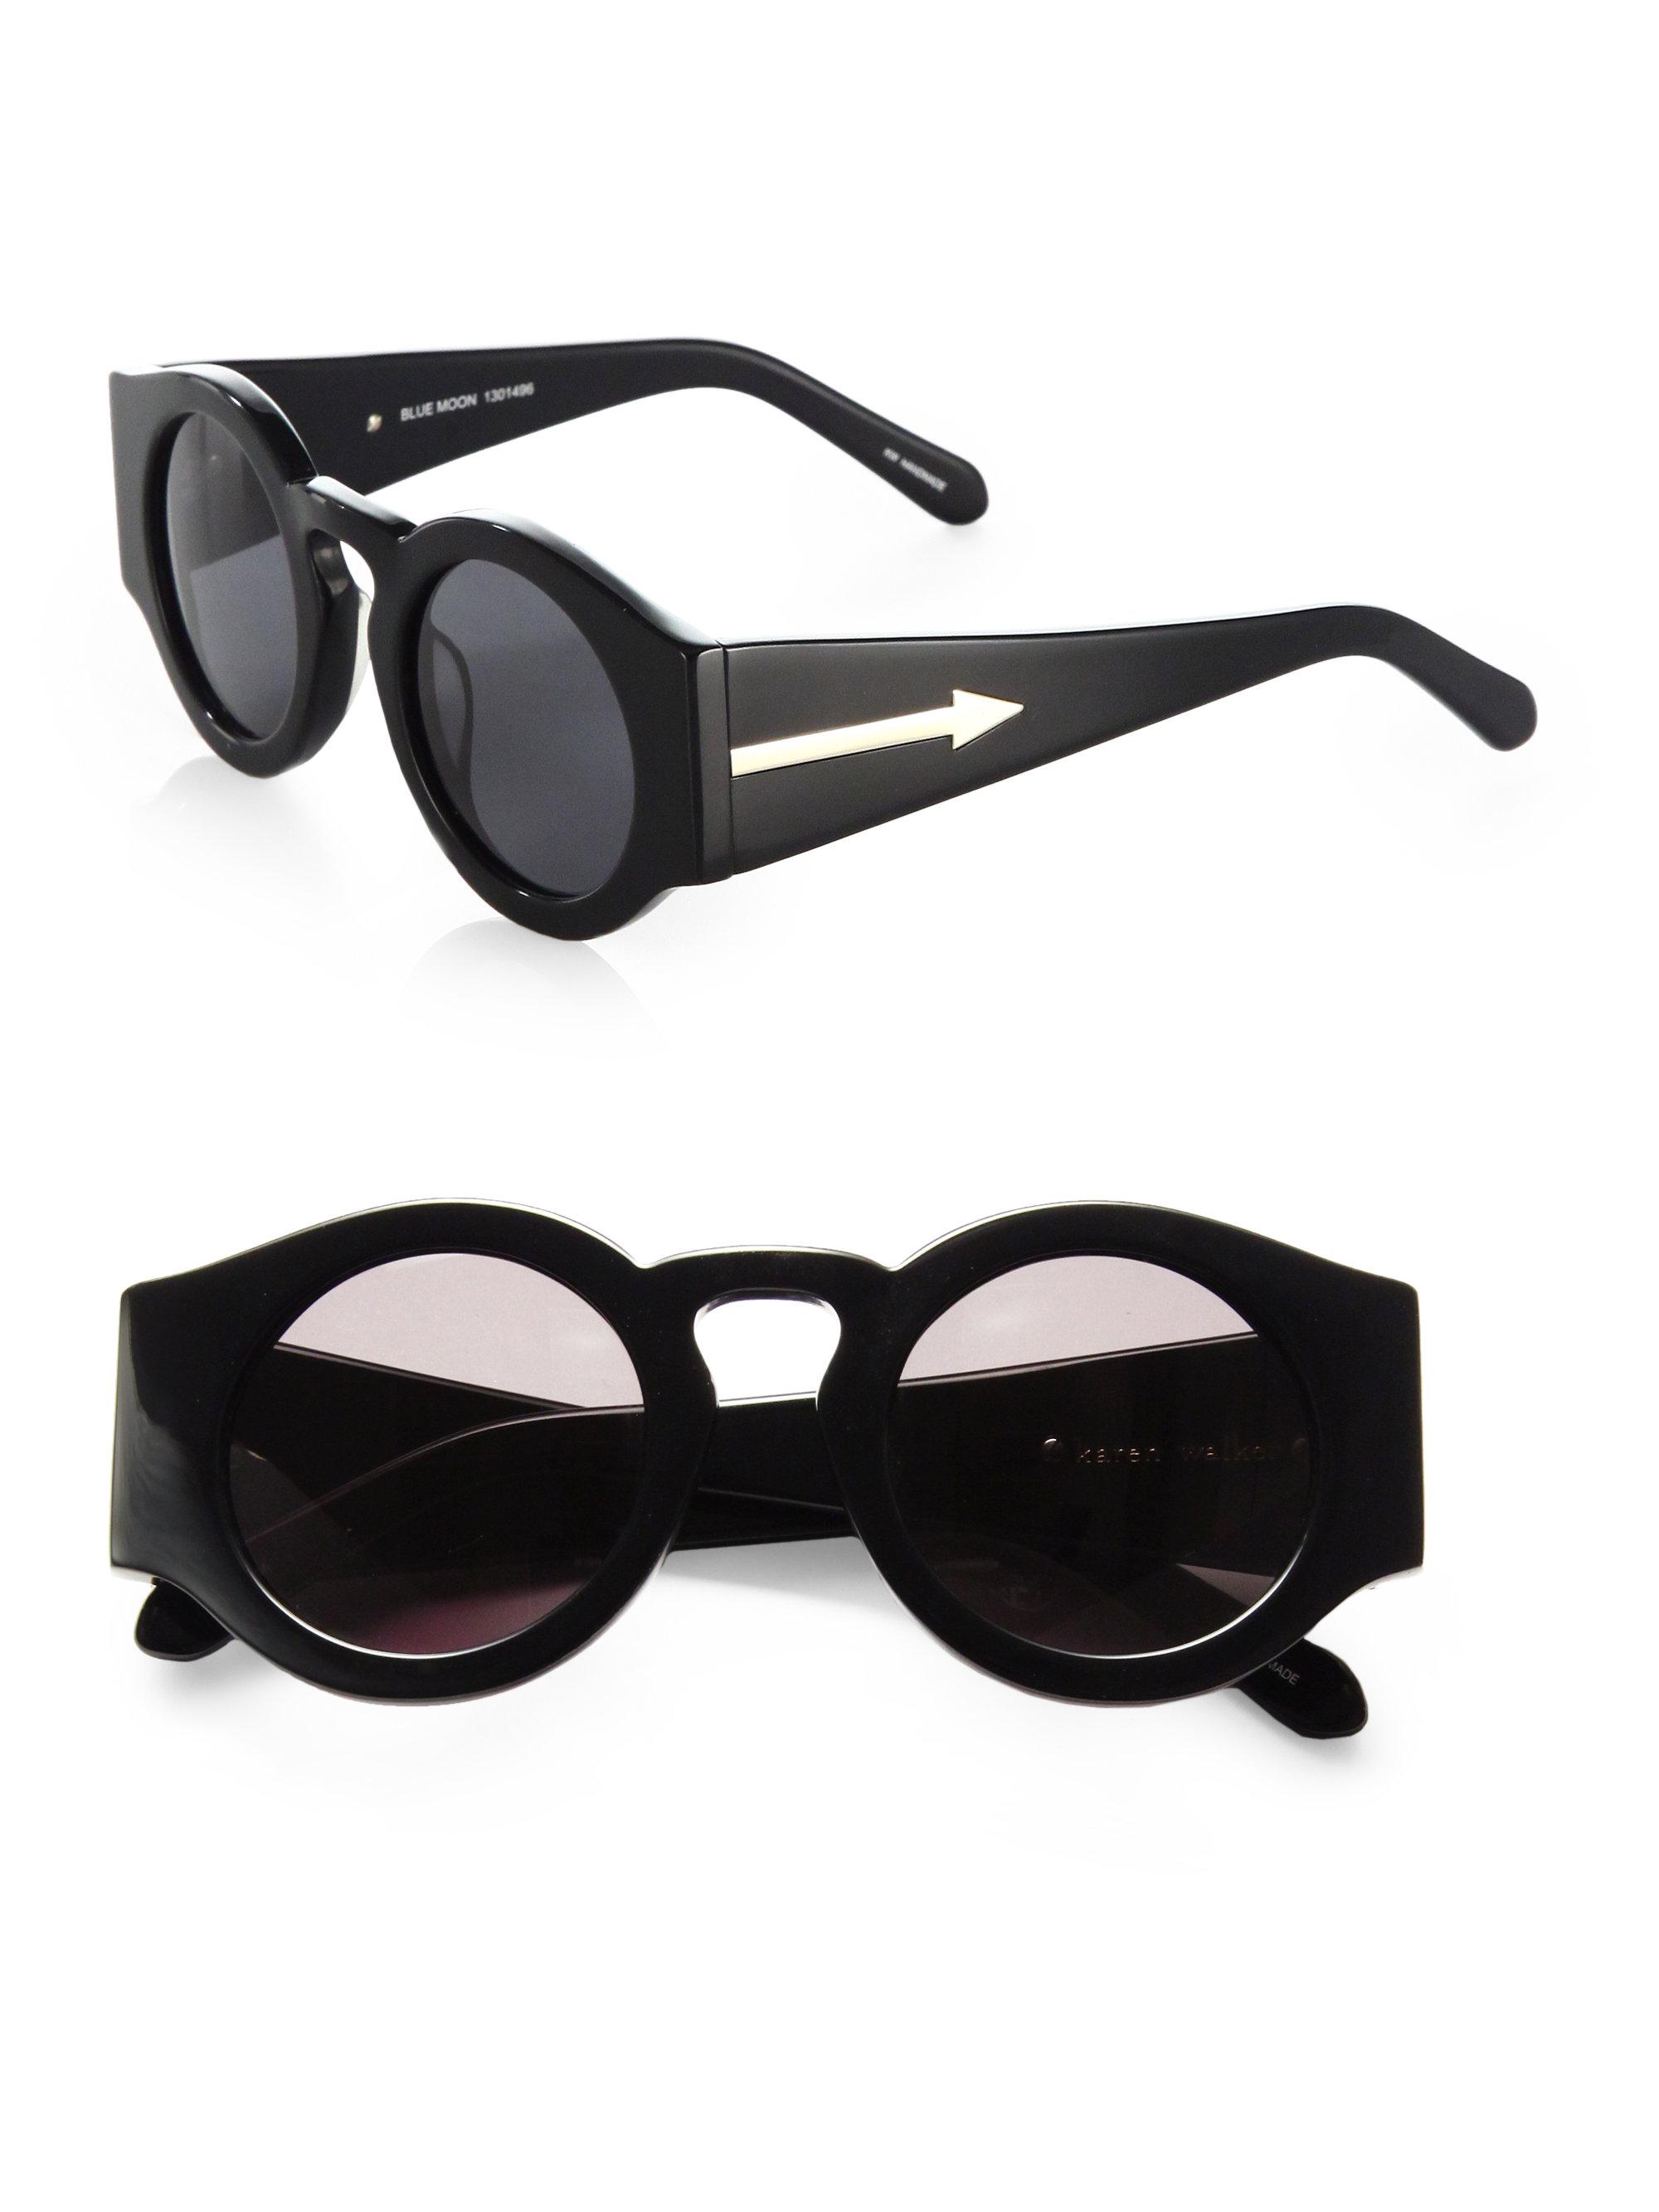 b81546e536d Lyst - Karen Walker Blue Moon Round Sunglasses in Black